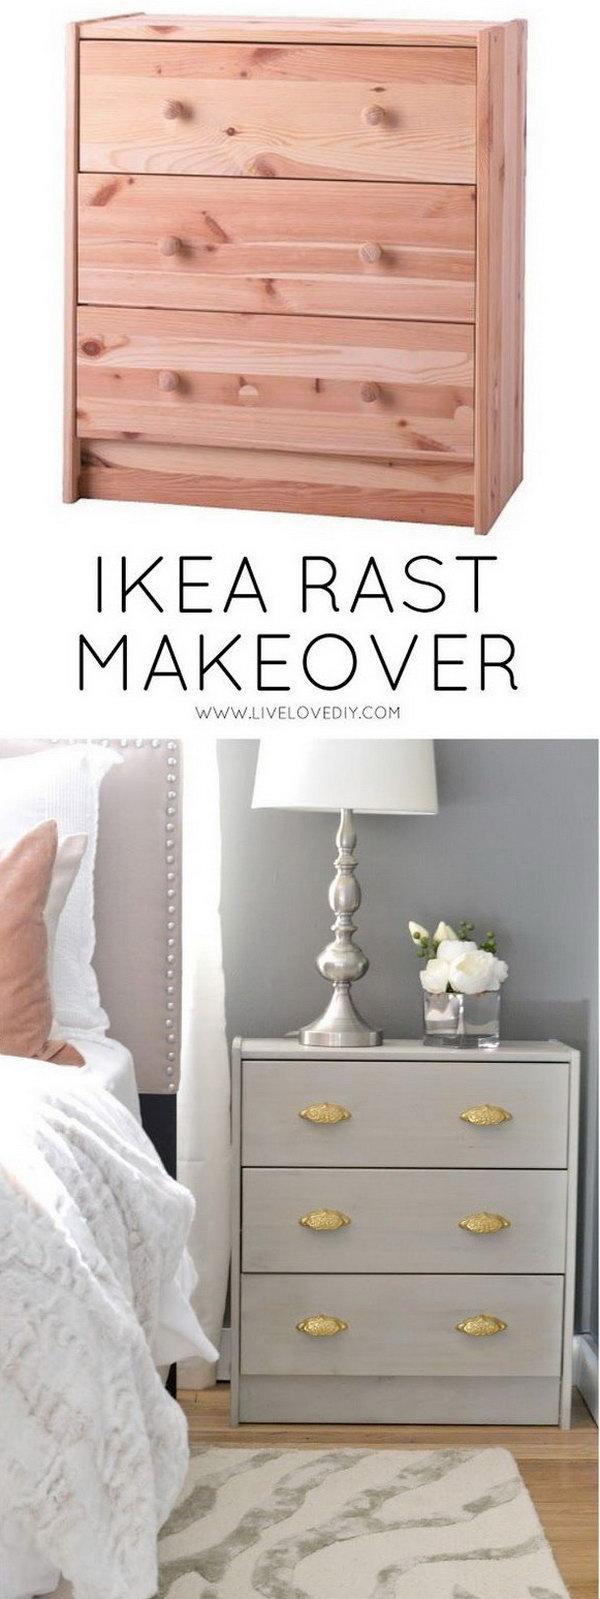 6 ikea rast hacks - 25 Simple and Creative IKEA Rast Hacks